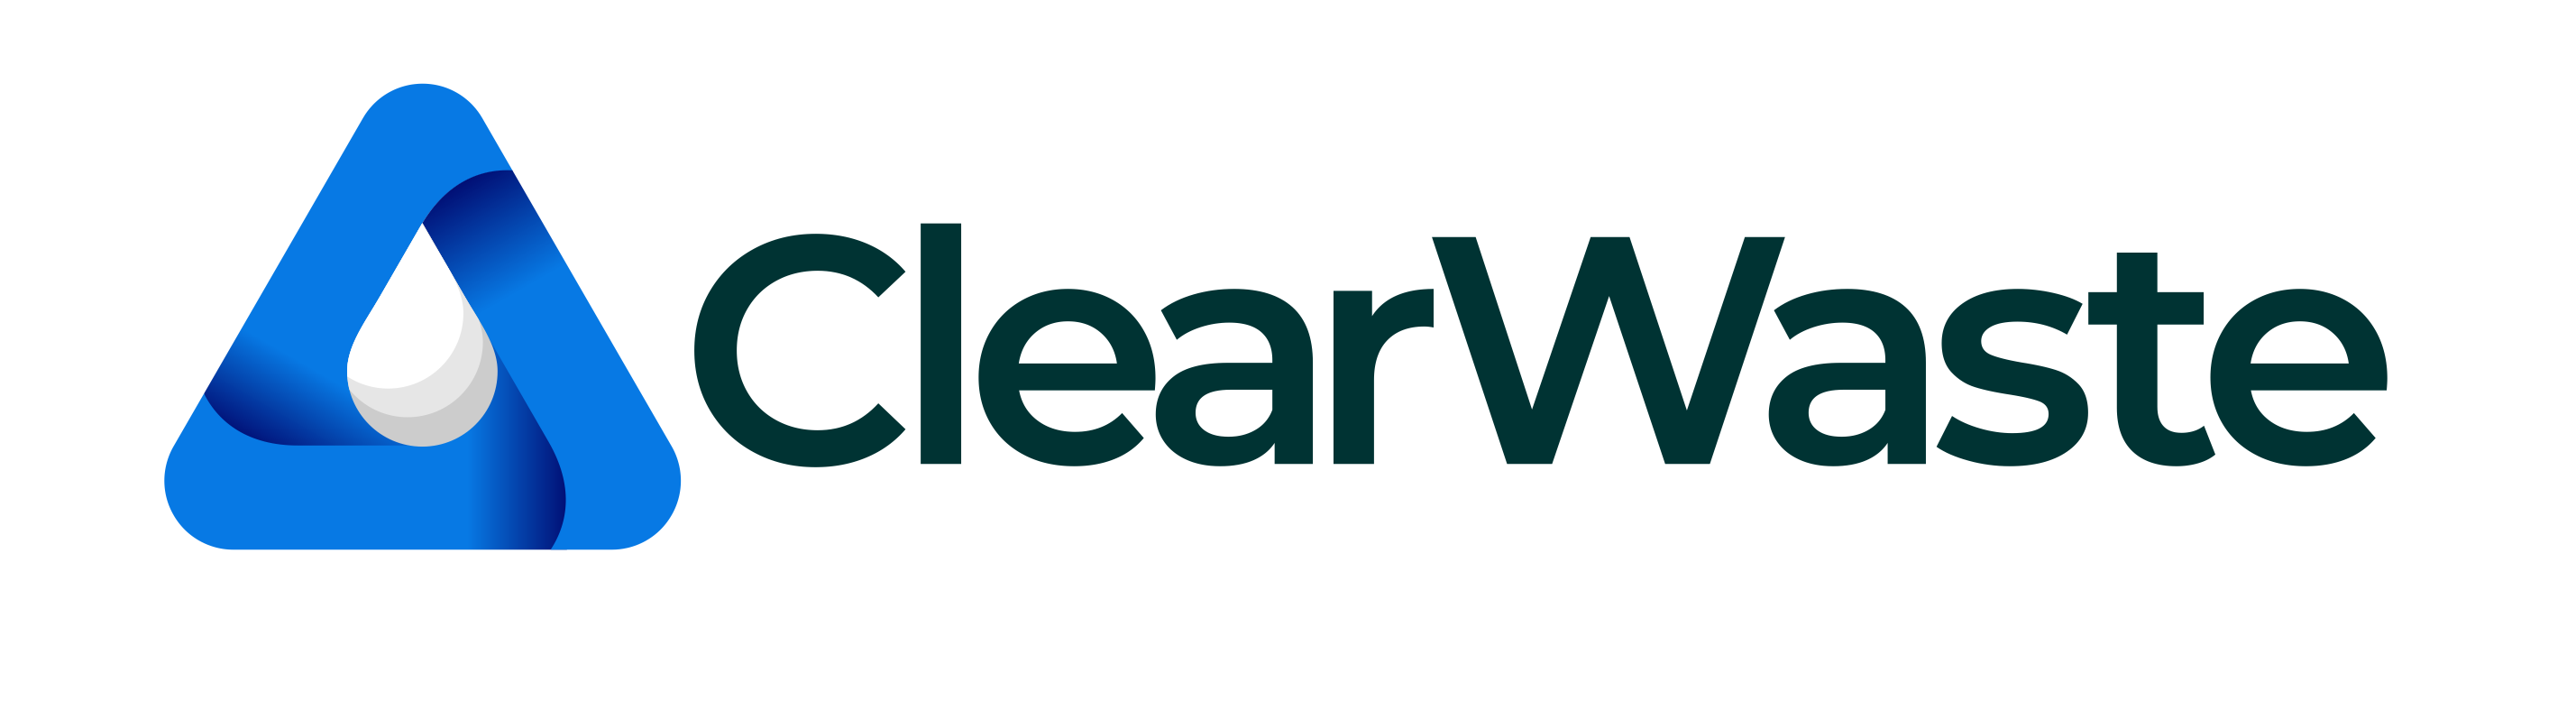 Wastewater Services & Waste Disposal